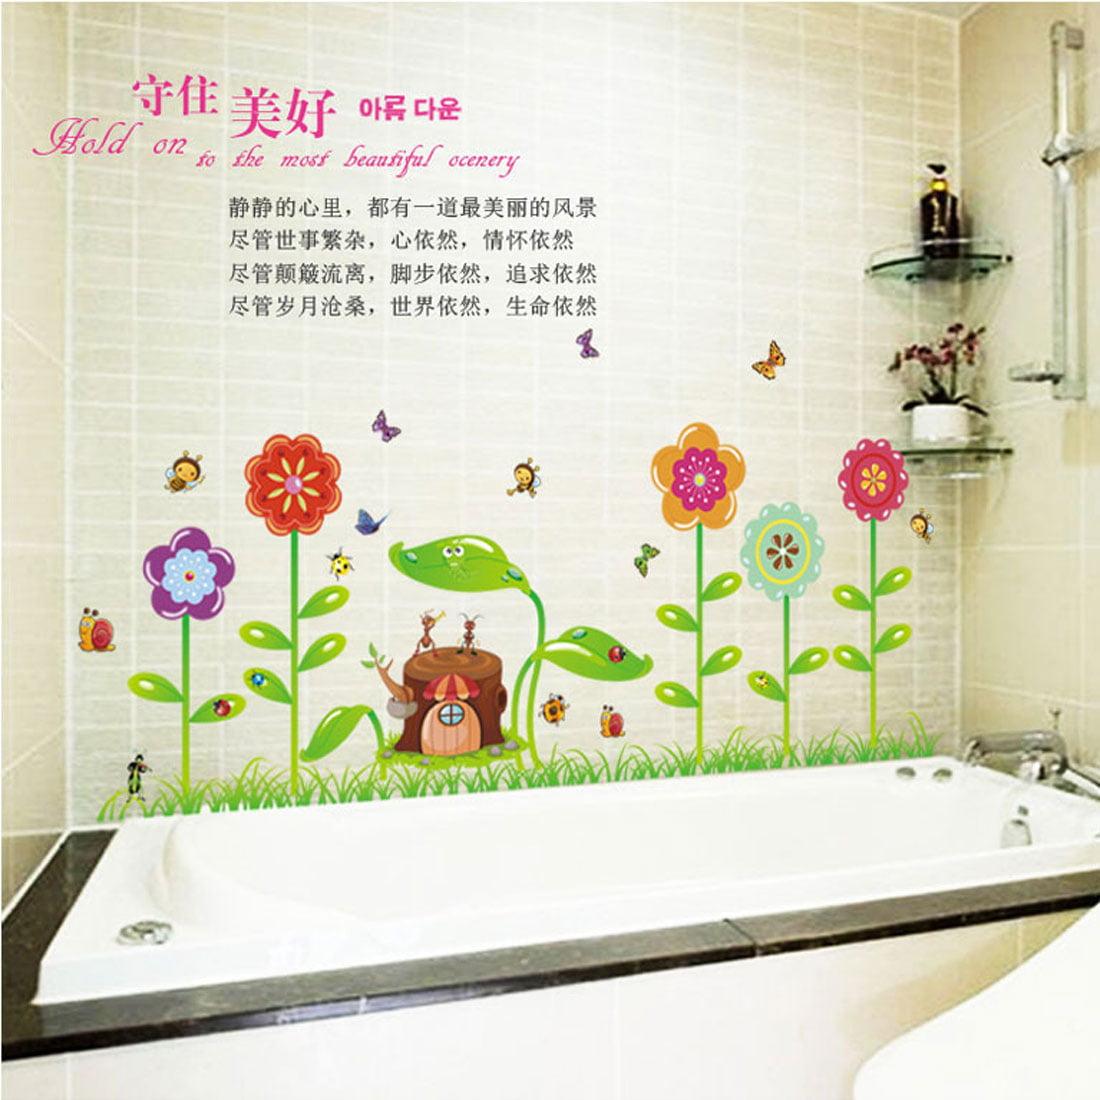 Flower Stump Print Water Resistant Adhesive Wall Sticker Decal Mural 70 x 50cm - image 4 de 5